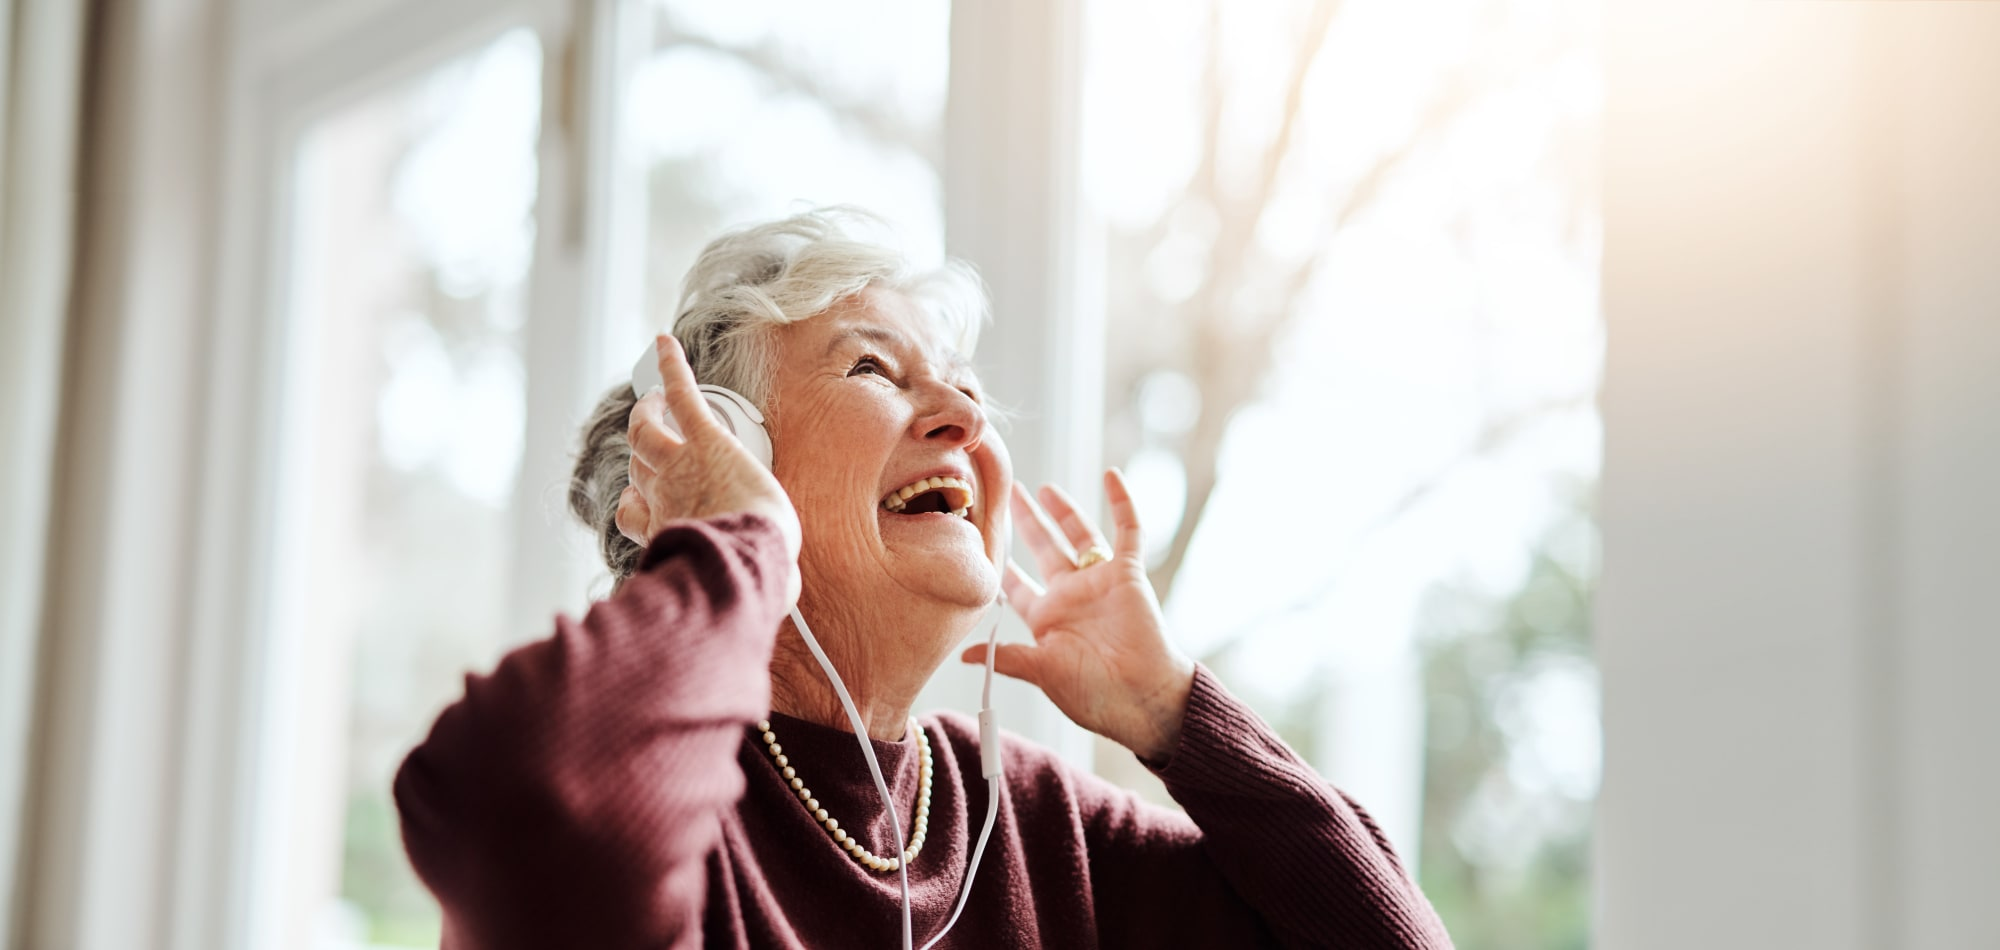 Activities and events at Milestone Senior Living in Faribault, Minnesota.